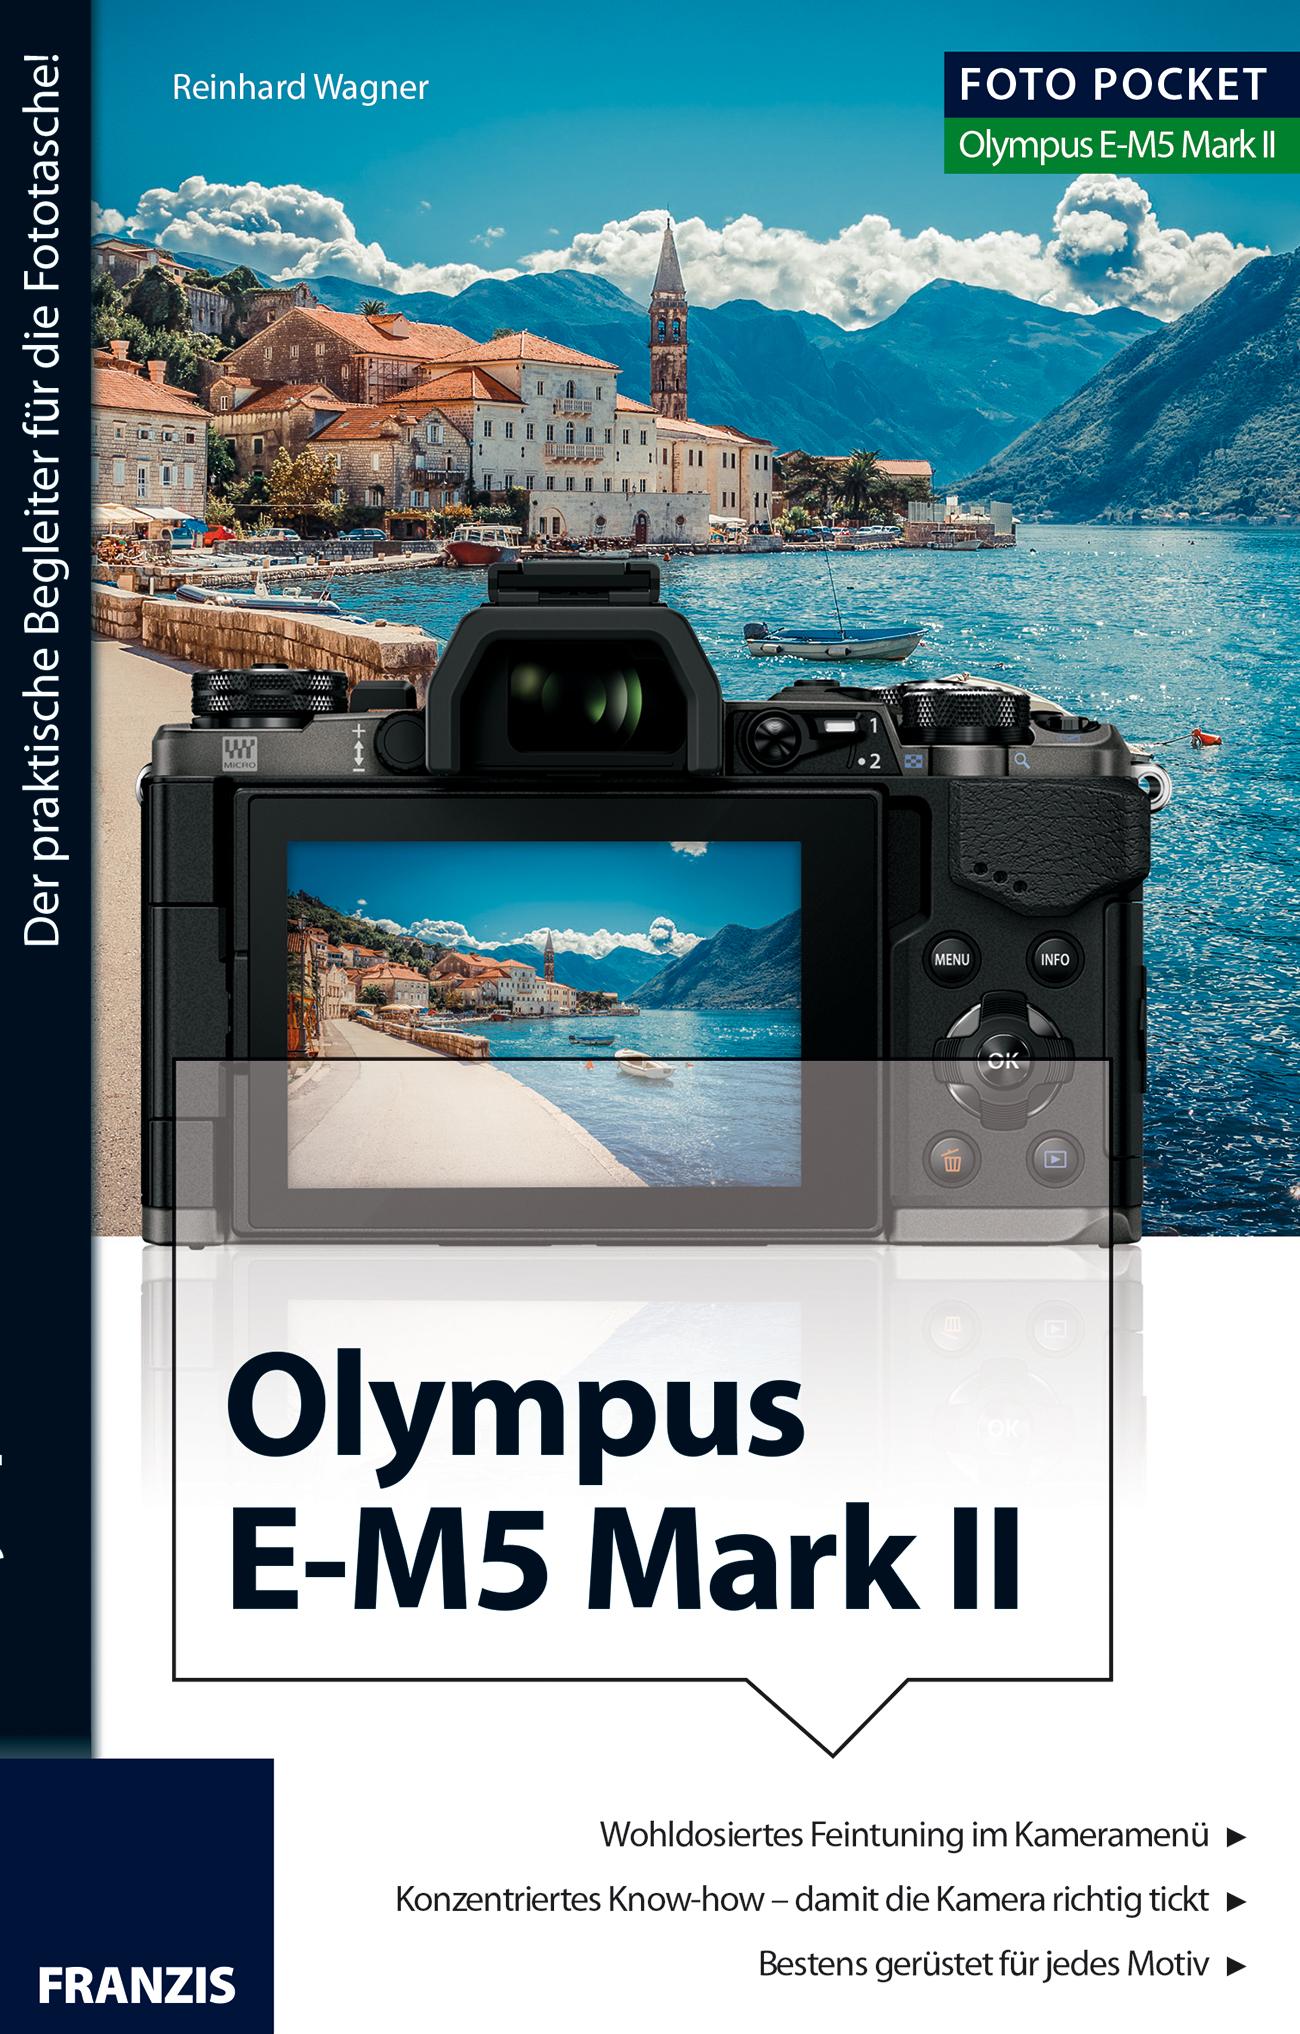 Foto Pocket Olympus OM-D E-M5 Mark II Reinhard Wagner